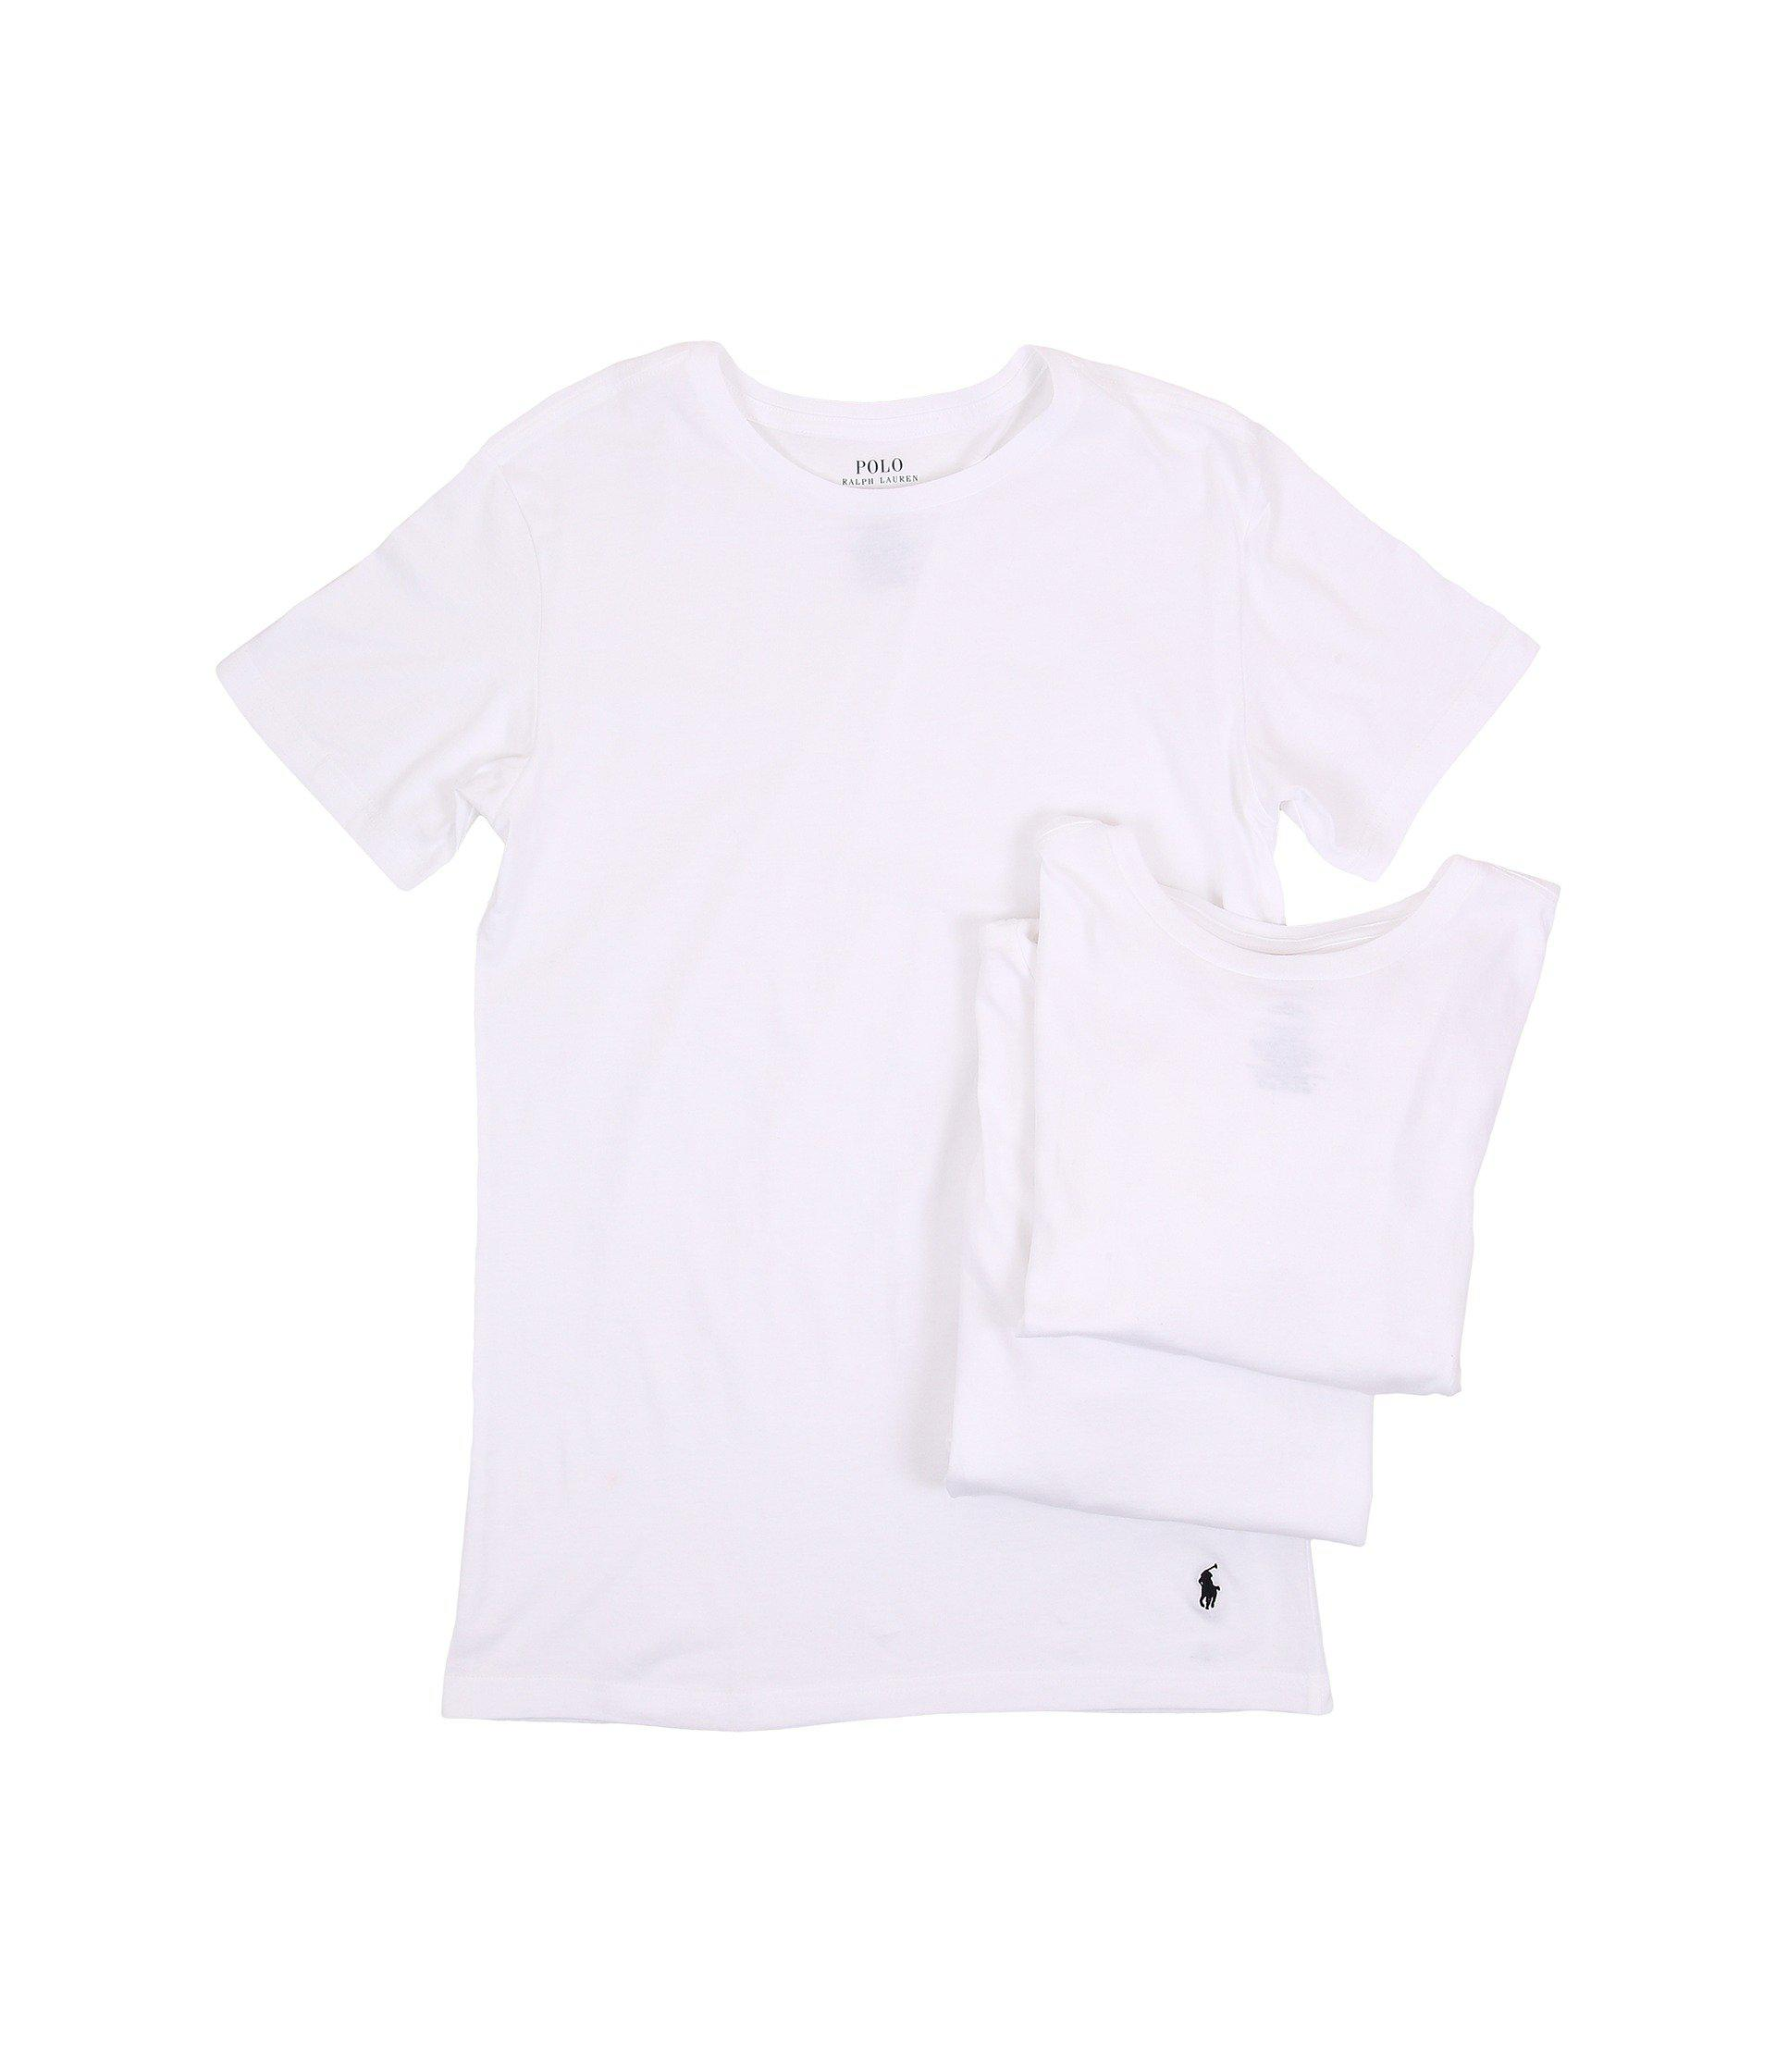 Lyst Polo Ralph Lauren 3 Pack Slim Fit Crew White Men S T Shirt